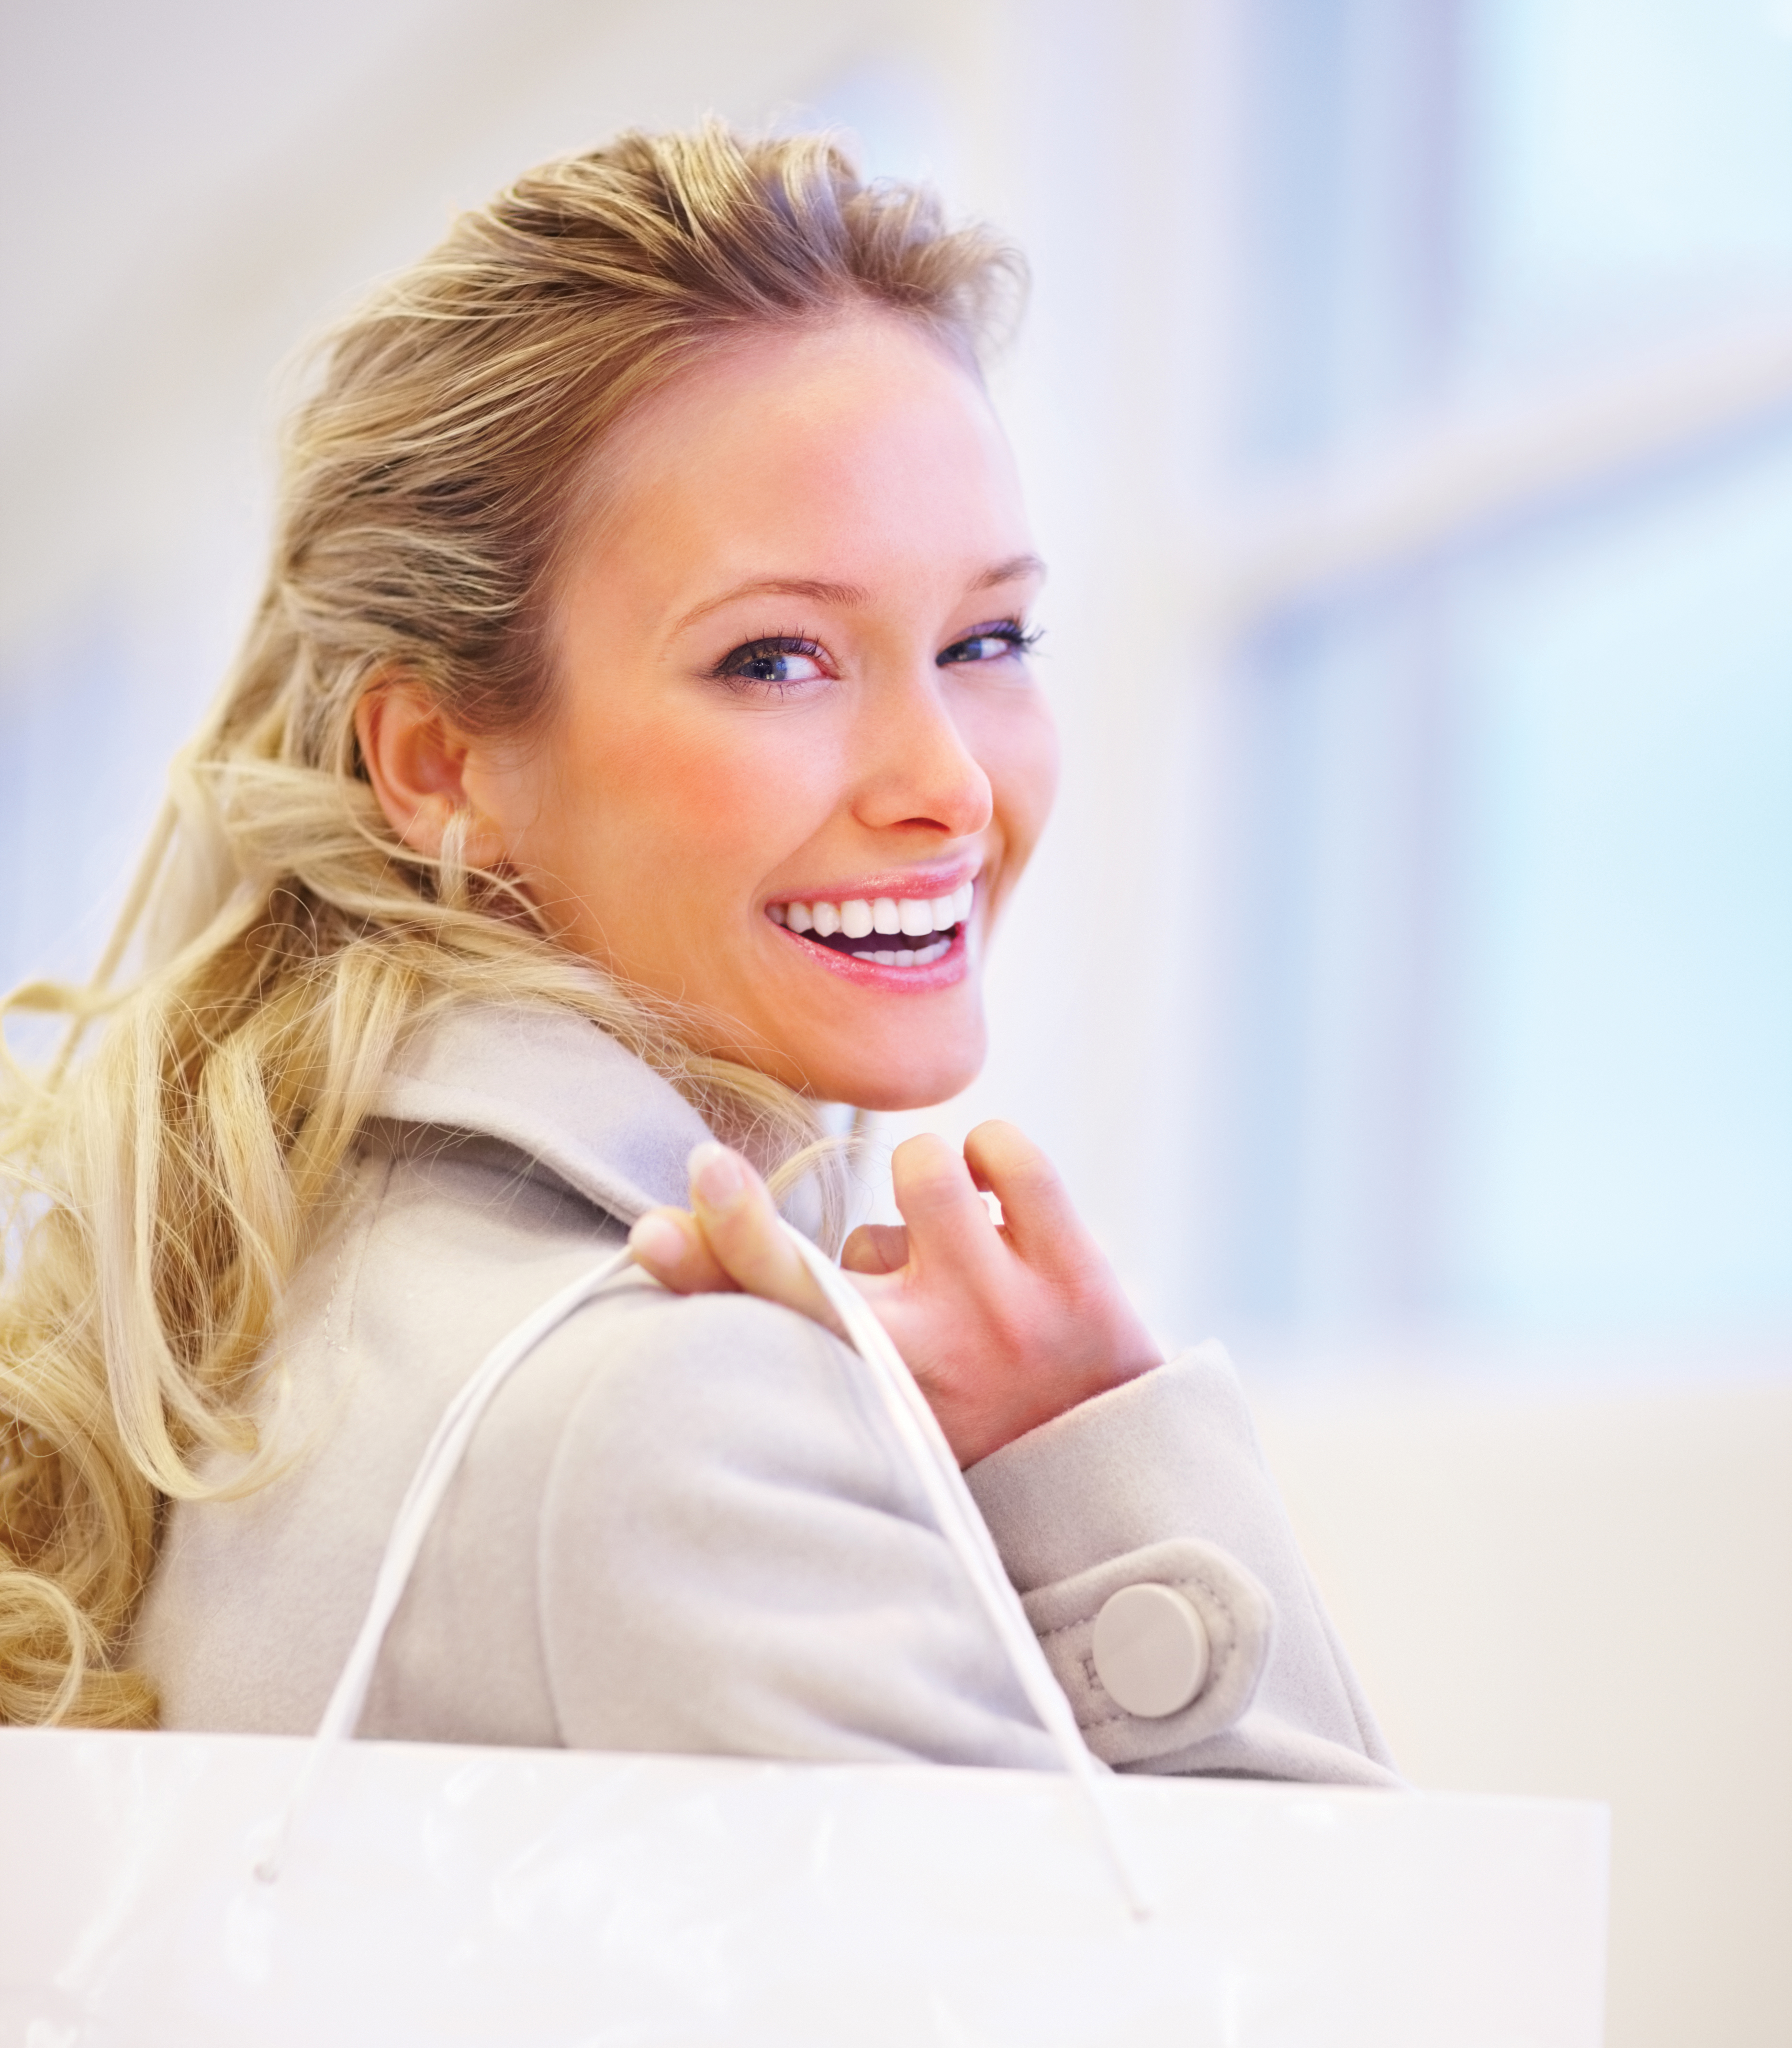 Teeth Whitening Making the White Choice 1